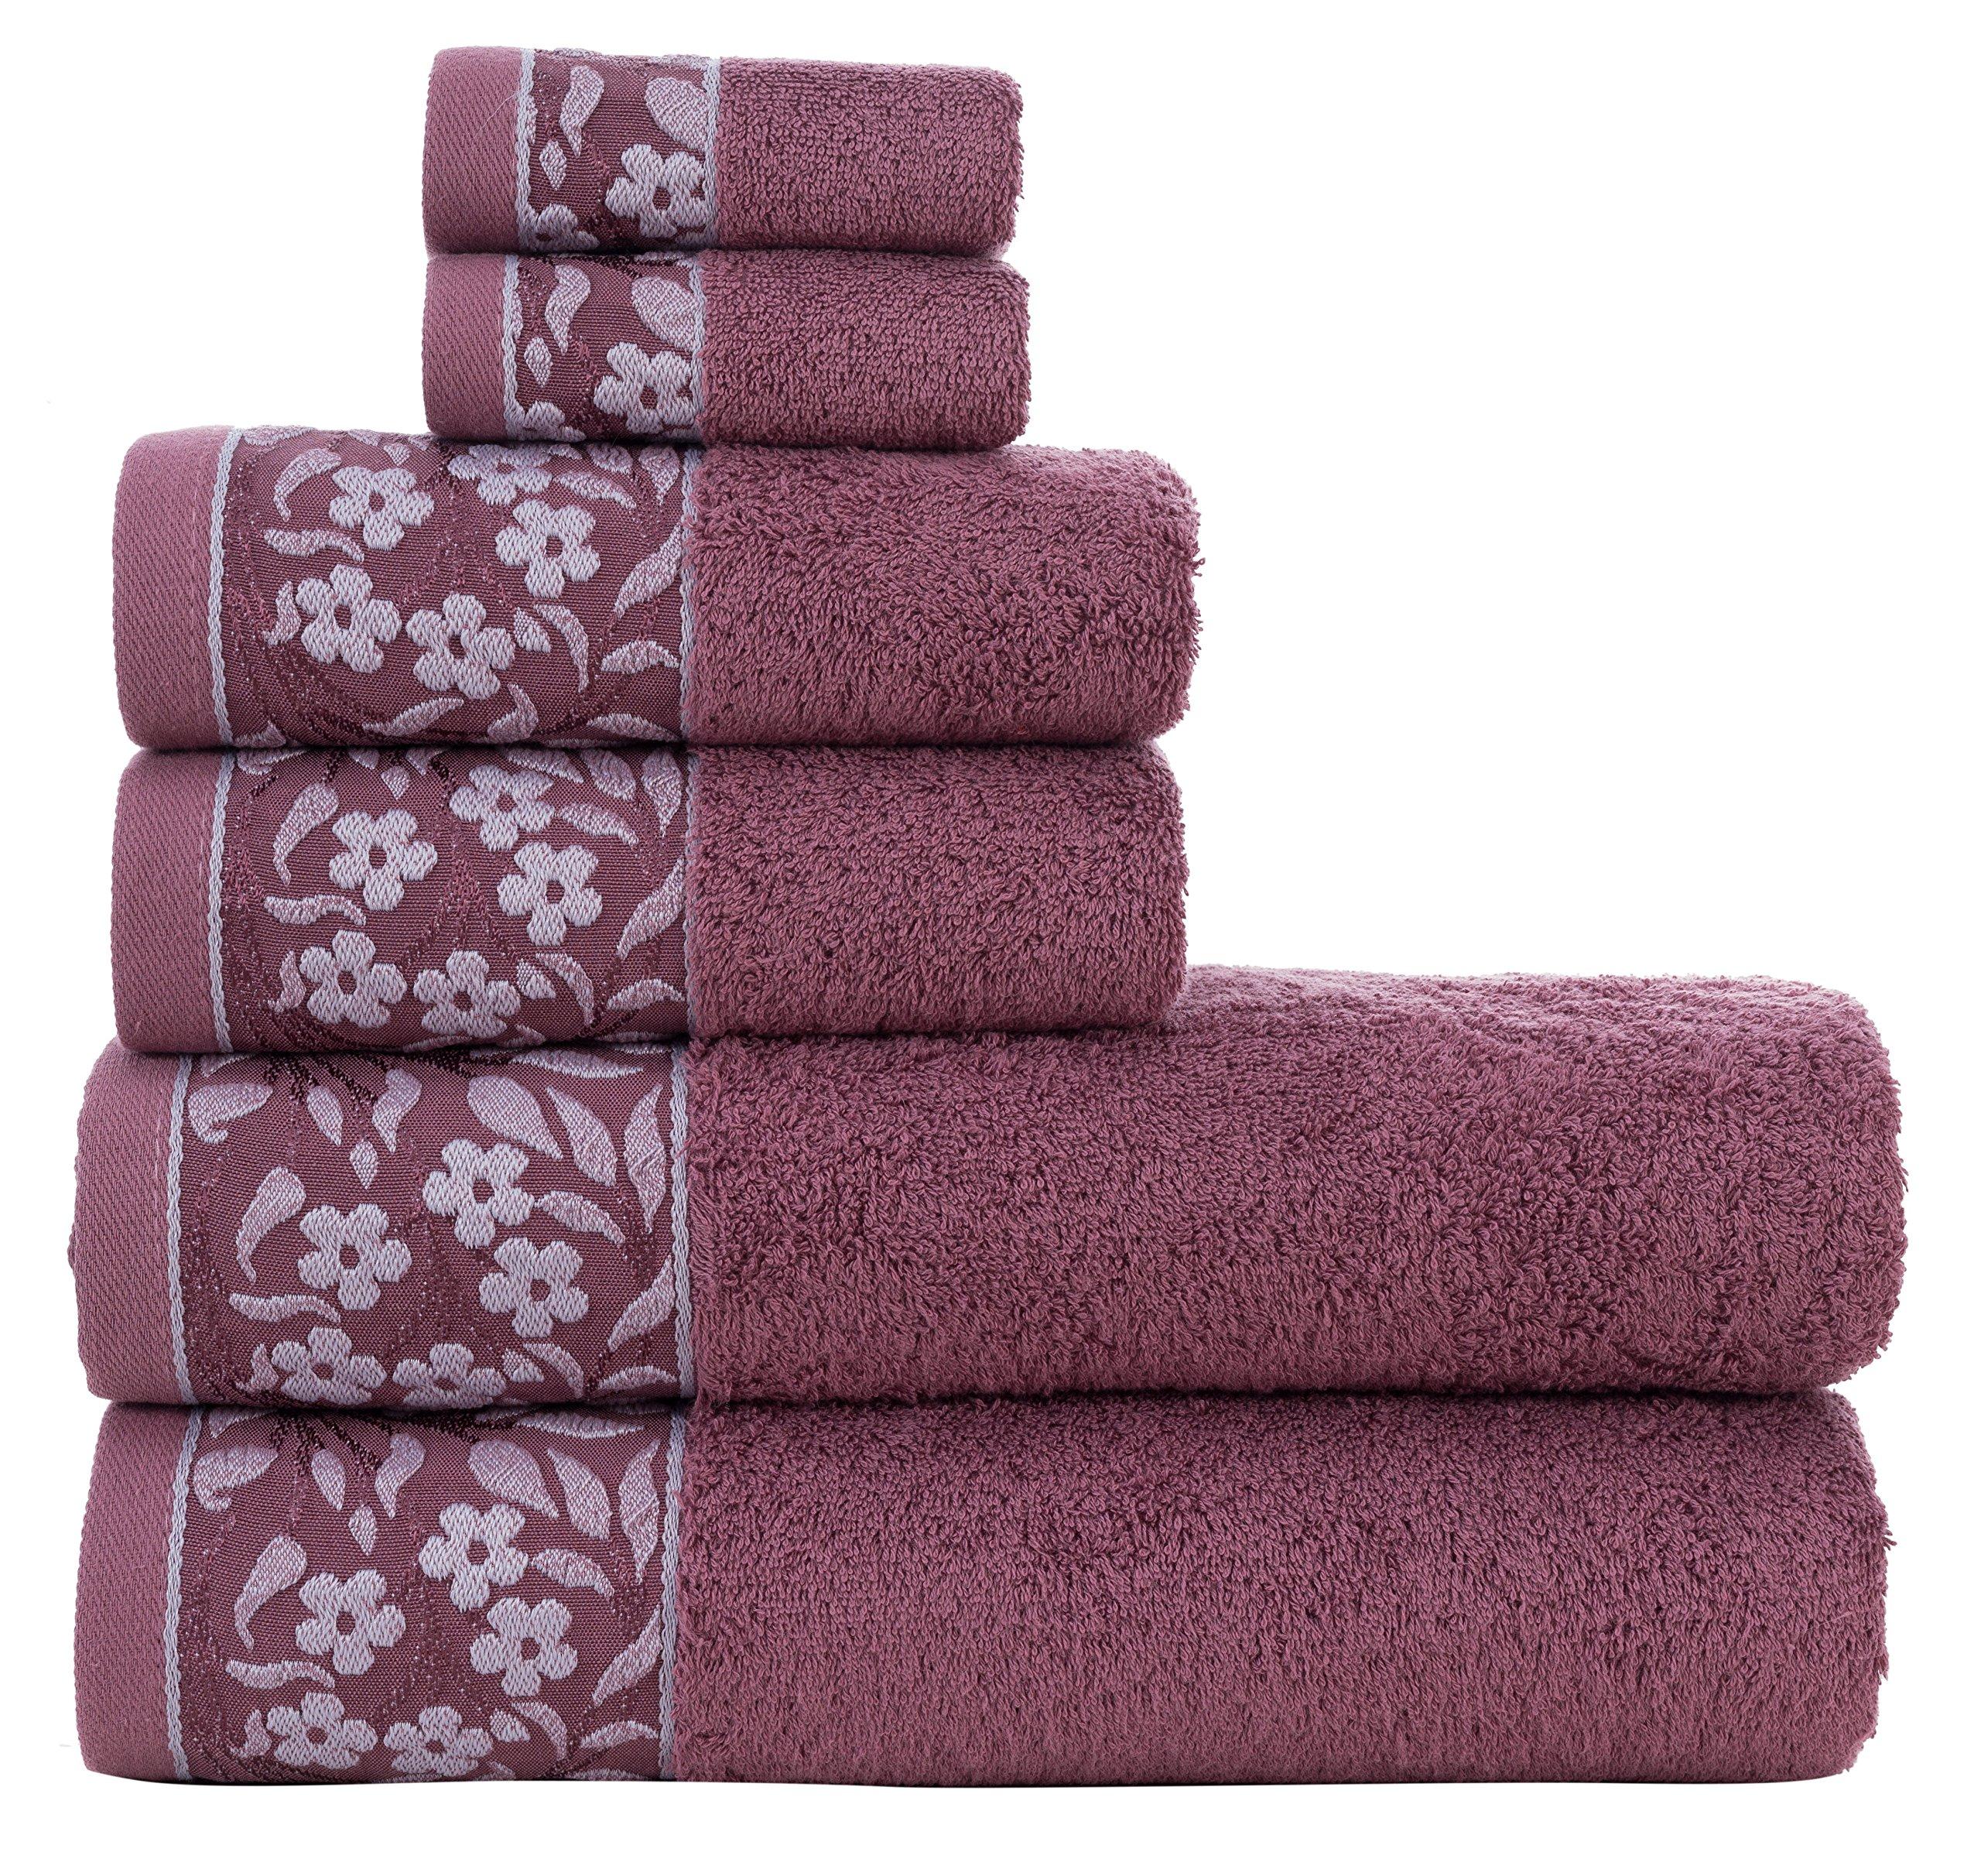 HYGGE Premium Turkish Cotton Towel Set with Floral Jacquard; 2 Bath Towels (27'' x 56''); 2 Hand Towels (19'' x 32''); 2 Washcloths (12'' x 12'')